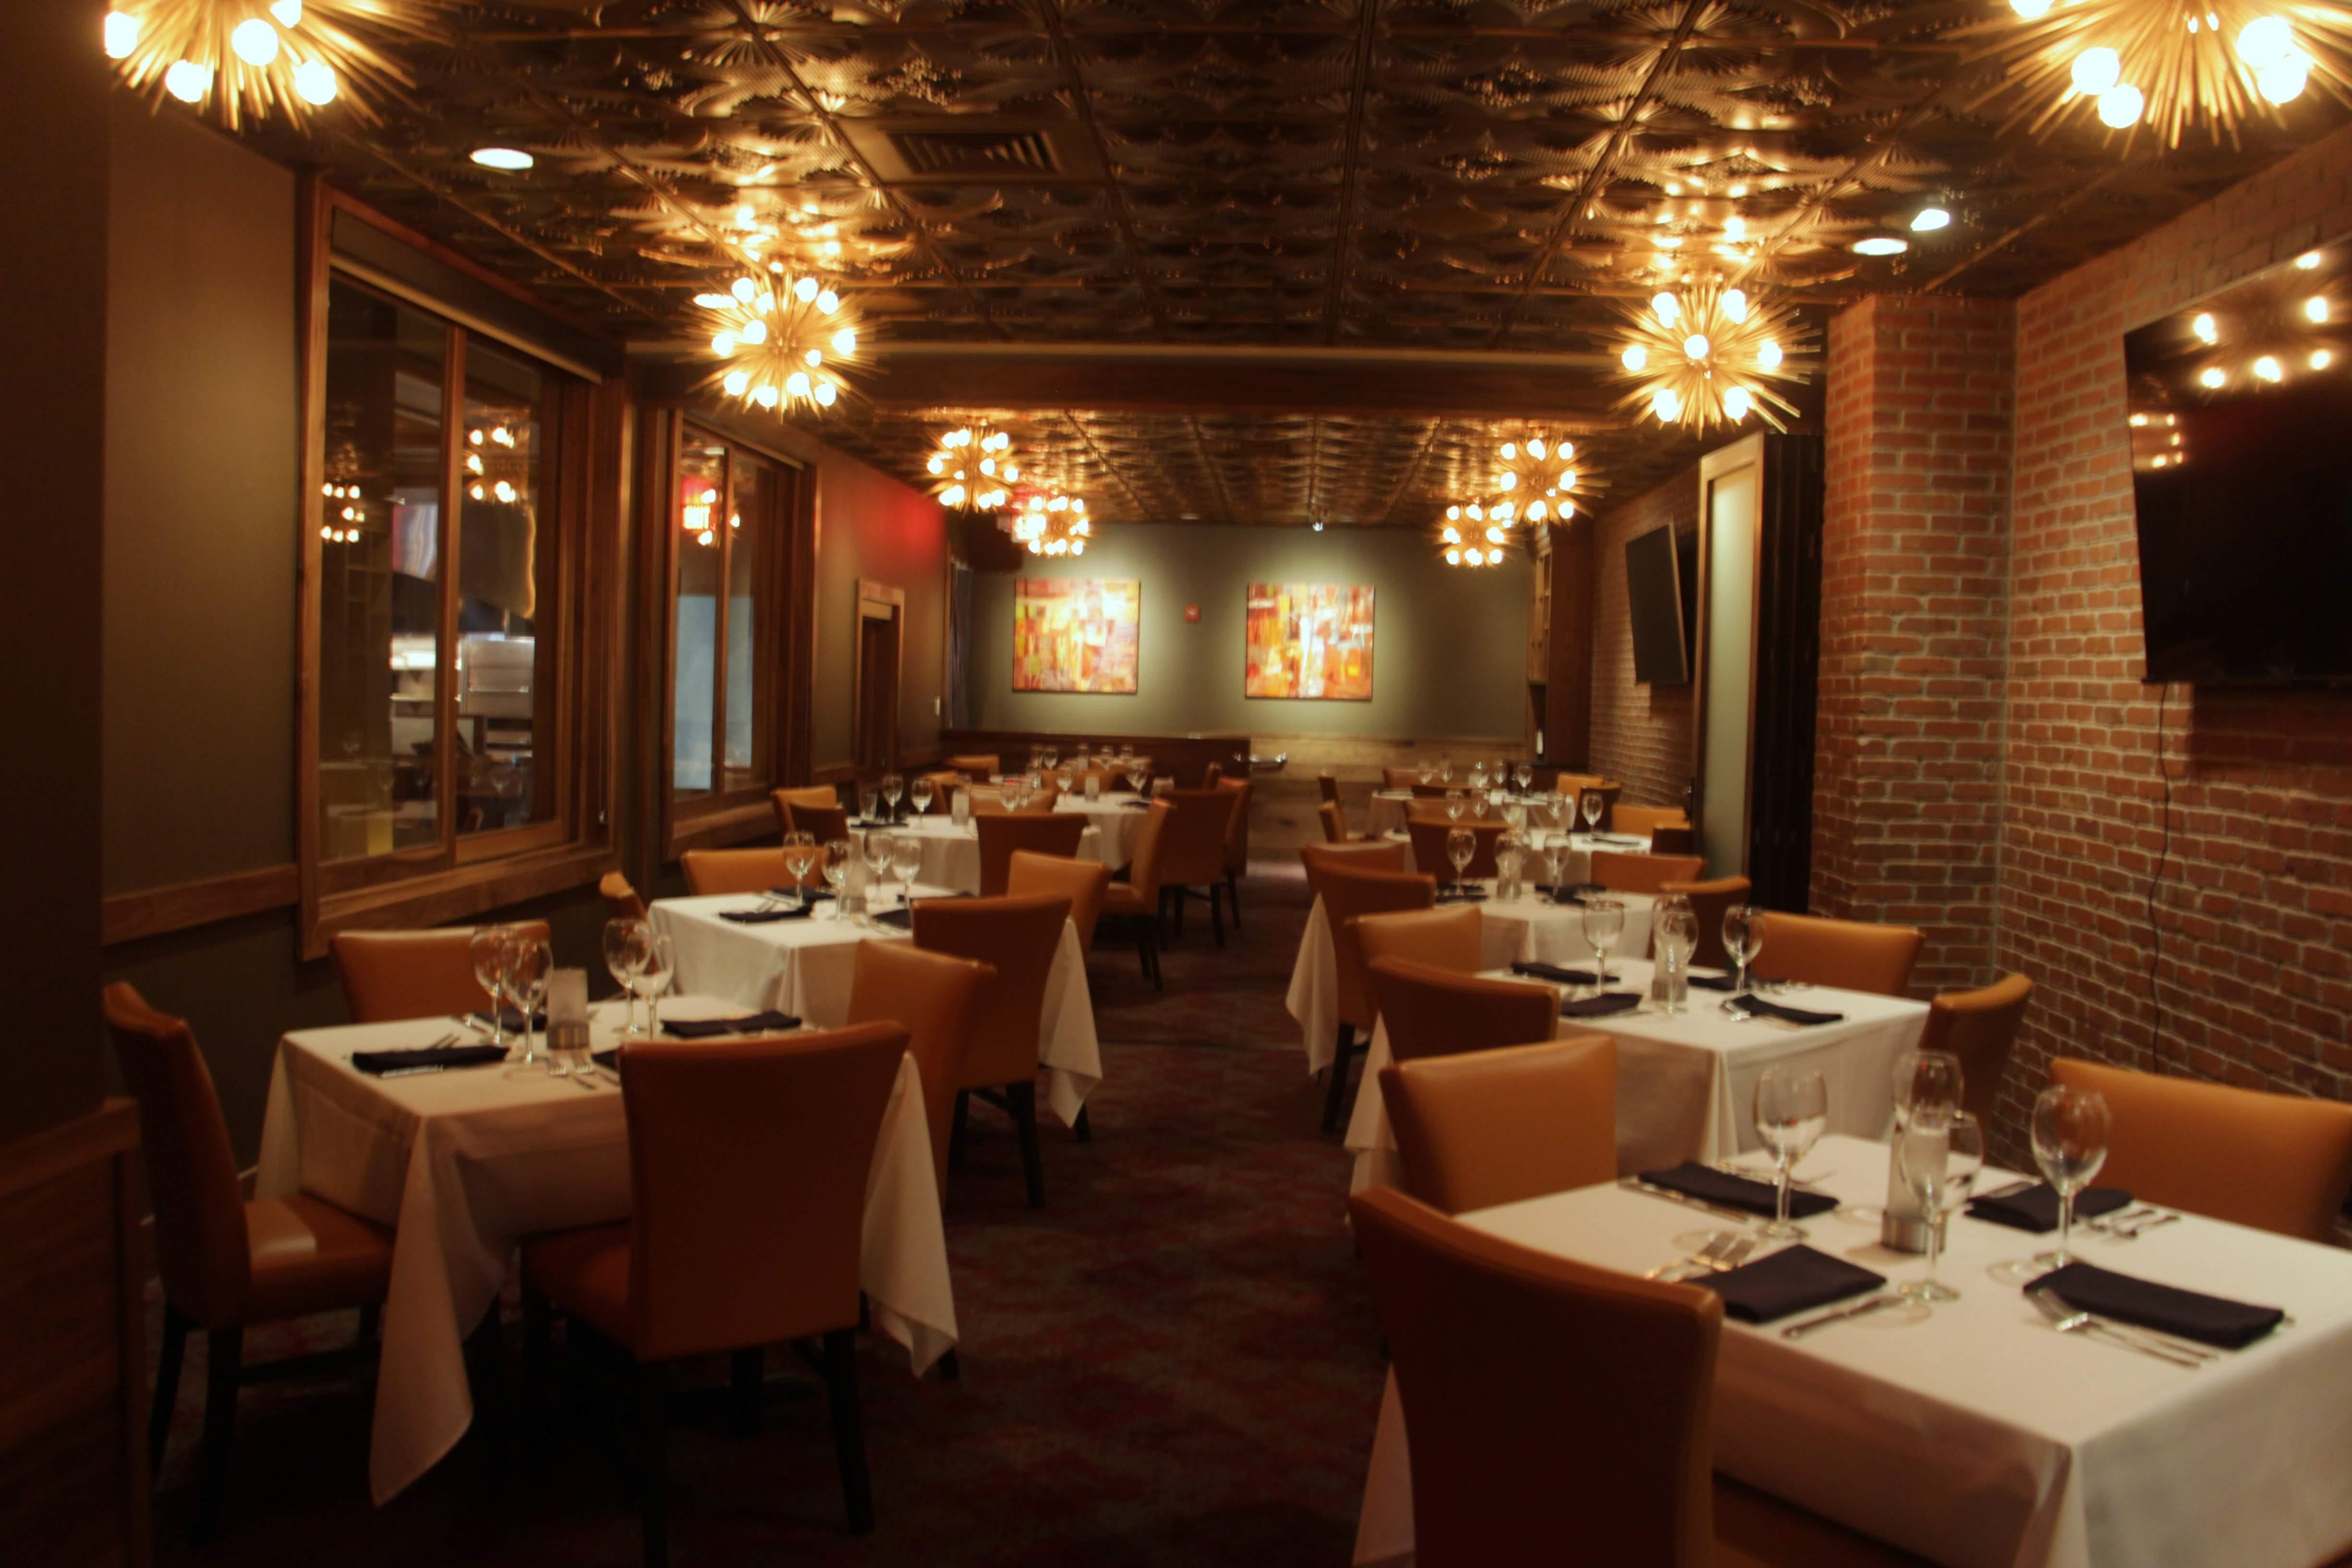 Sullivans Steakhouse Naperville